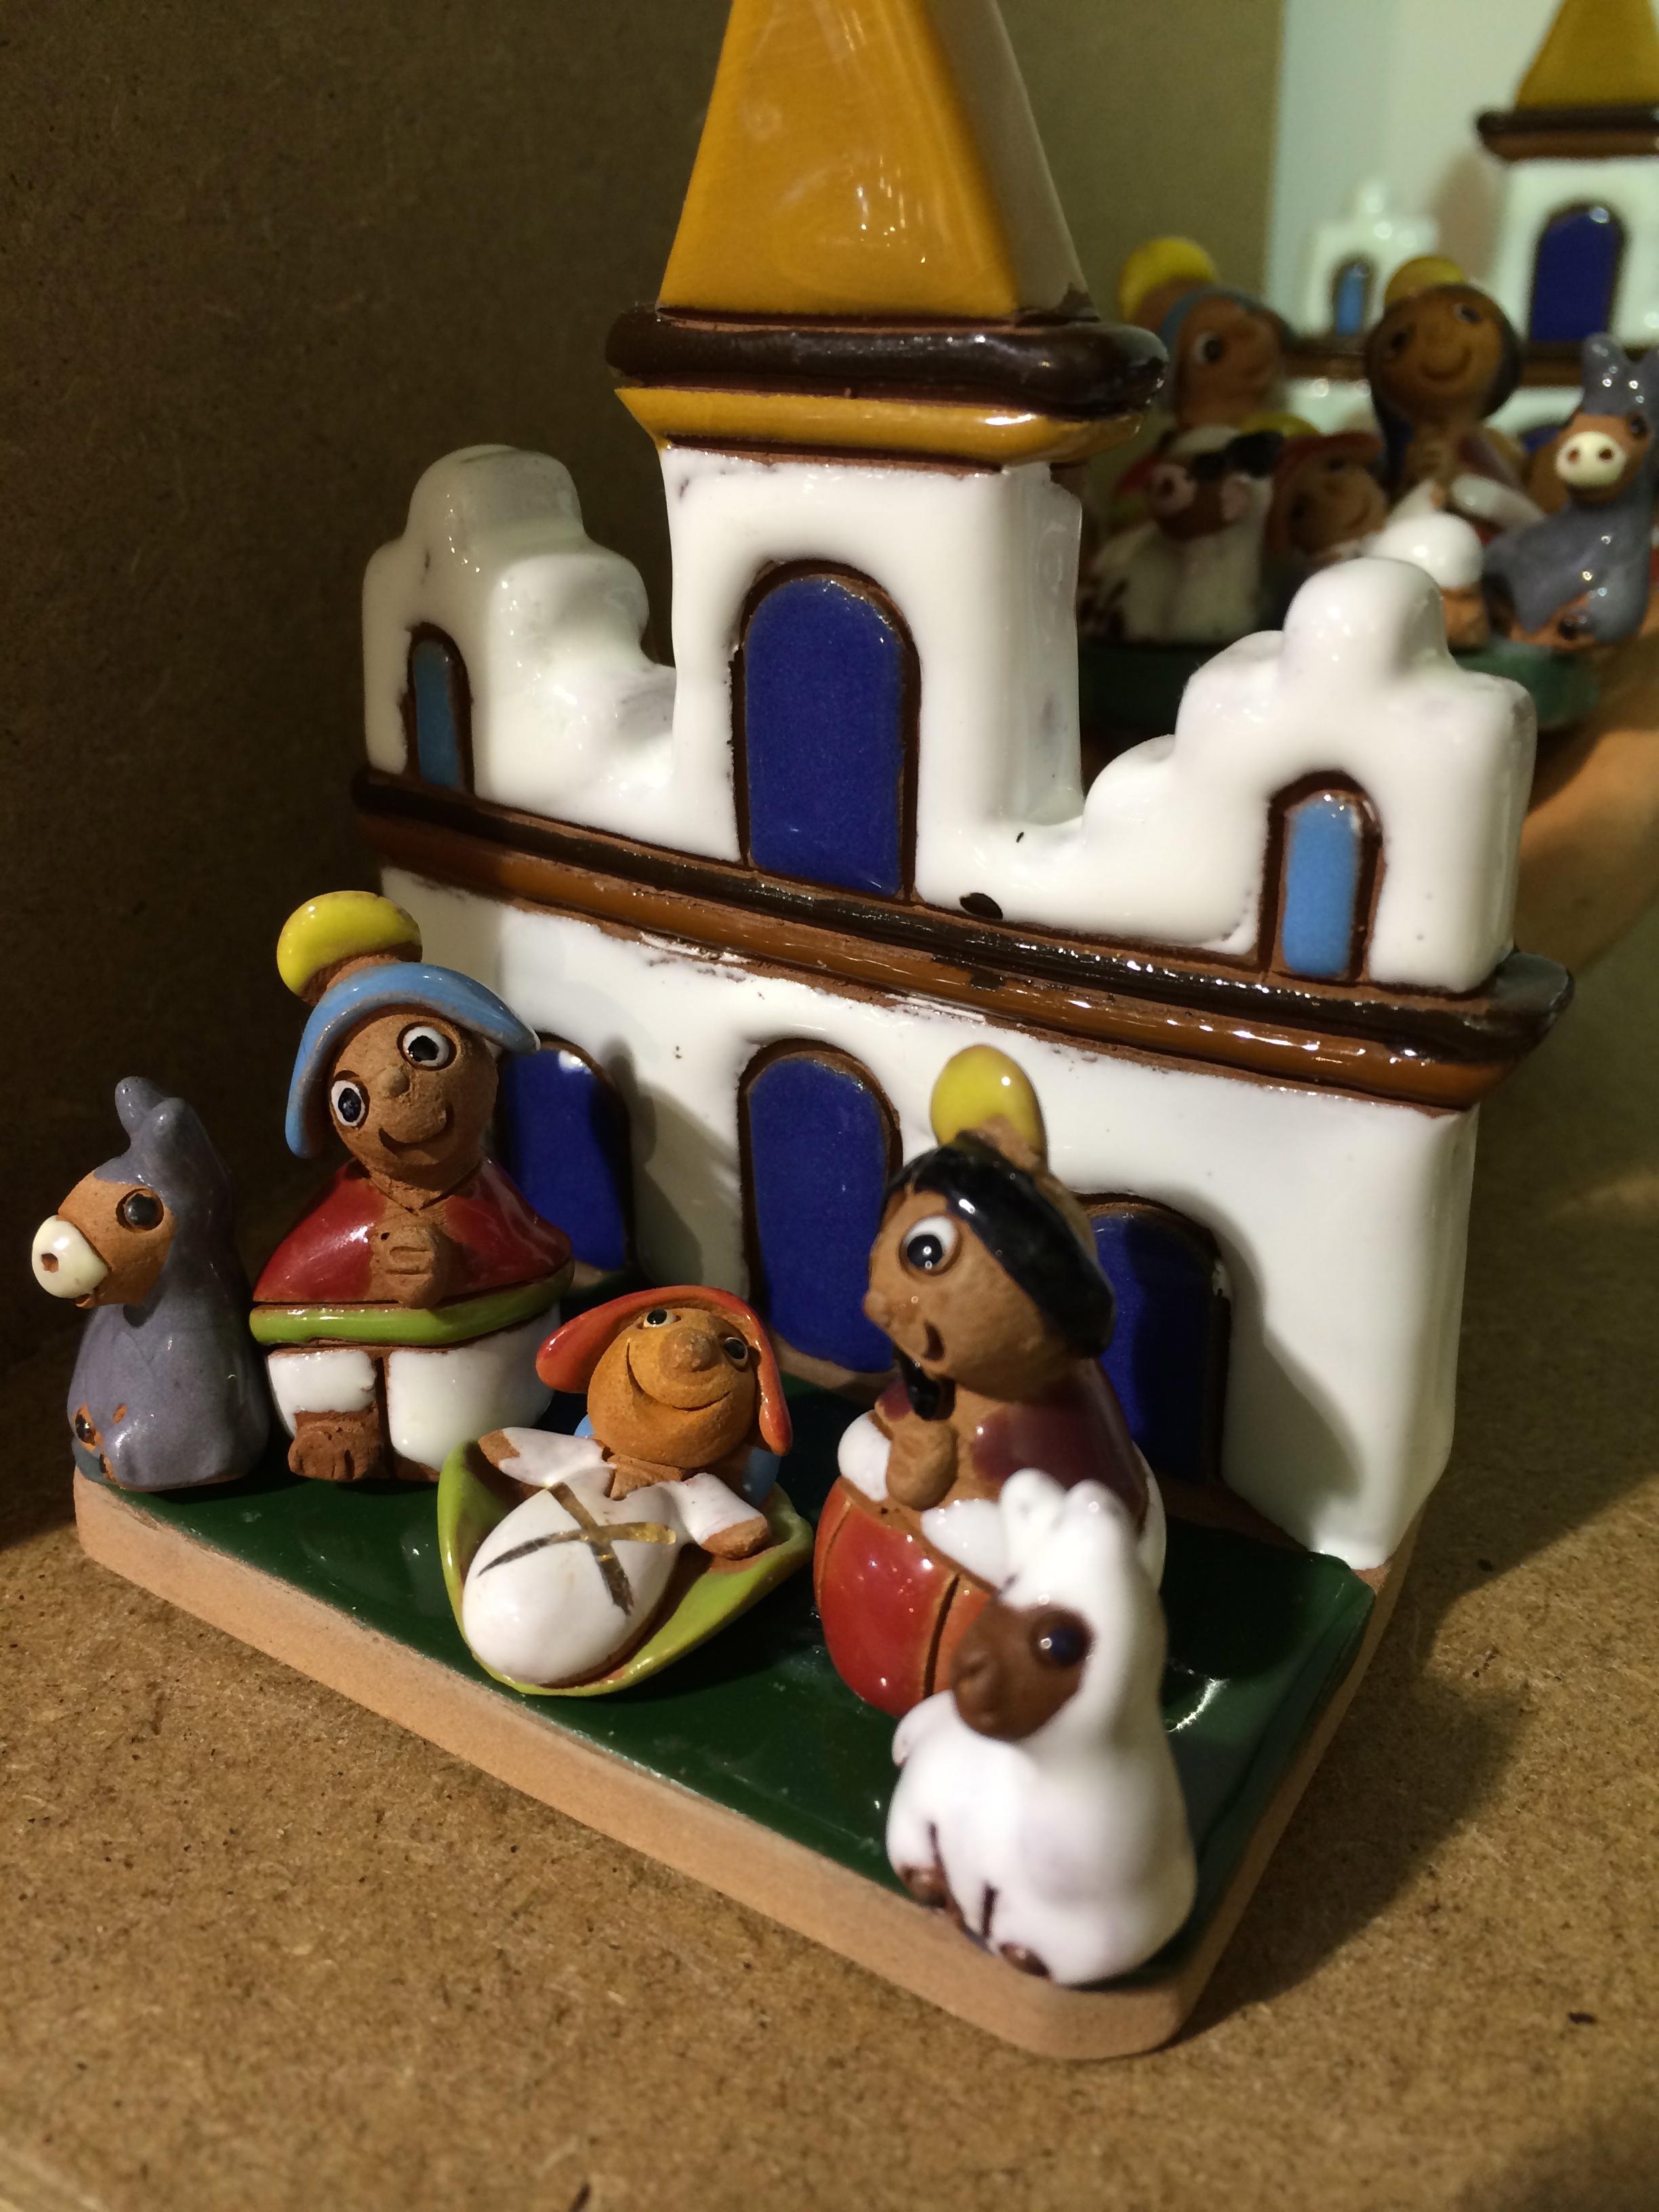 Bolivian nativity scene.